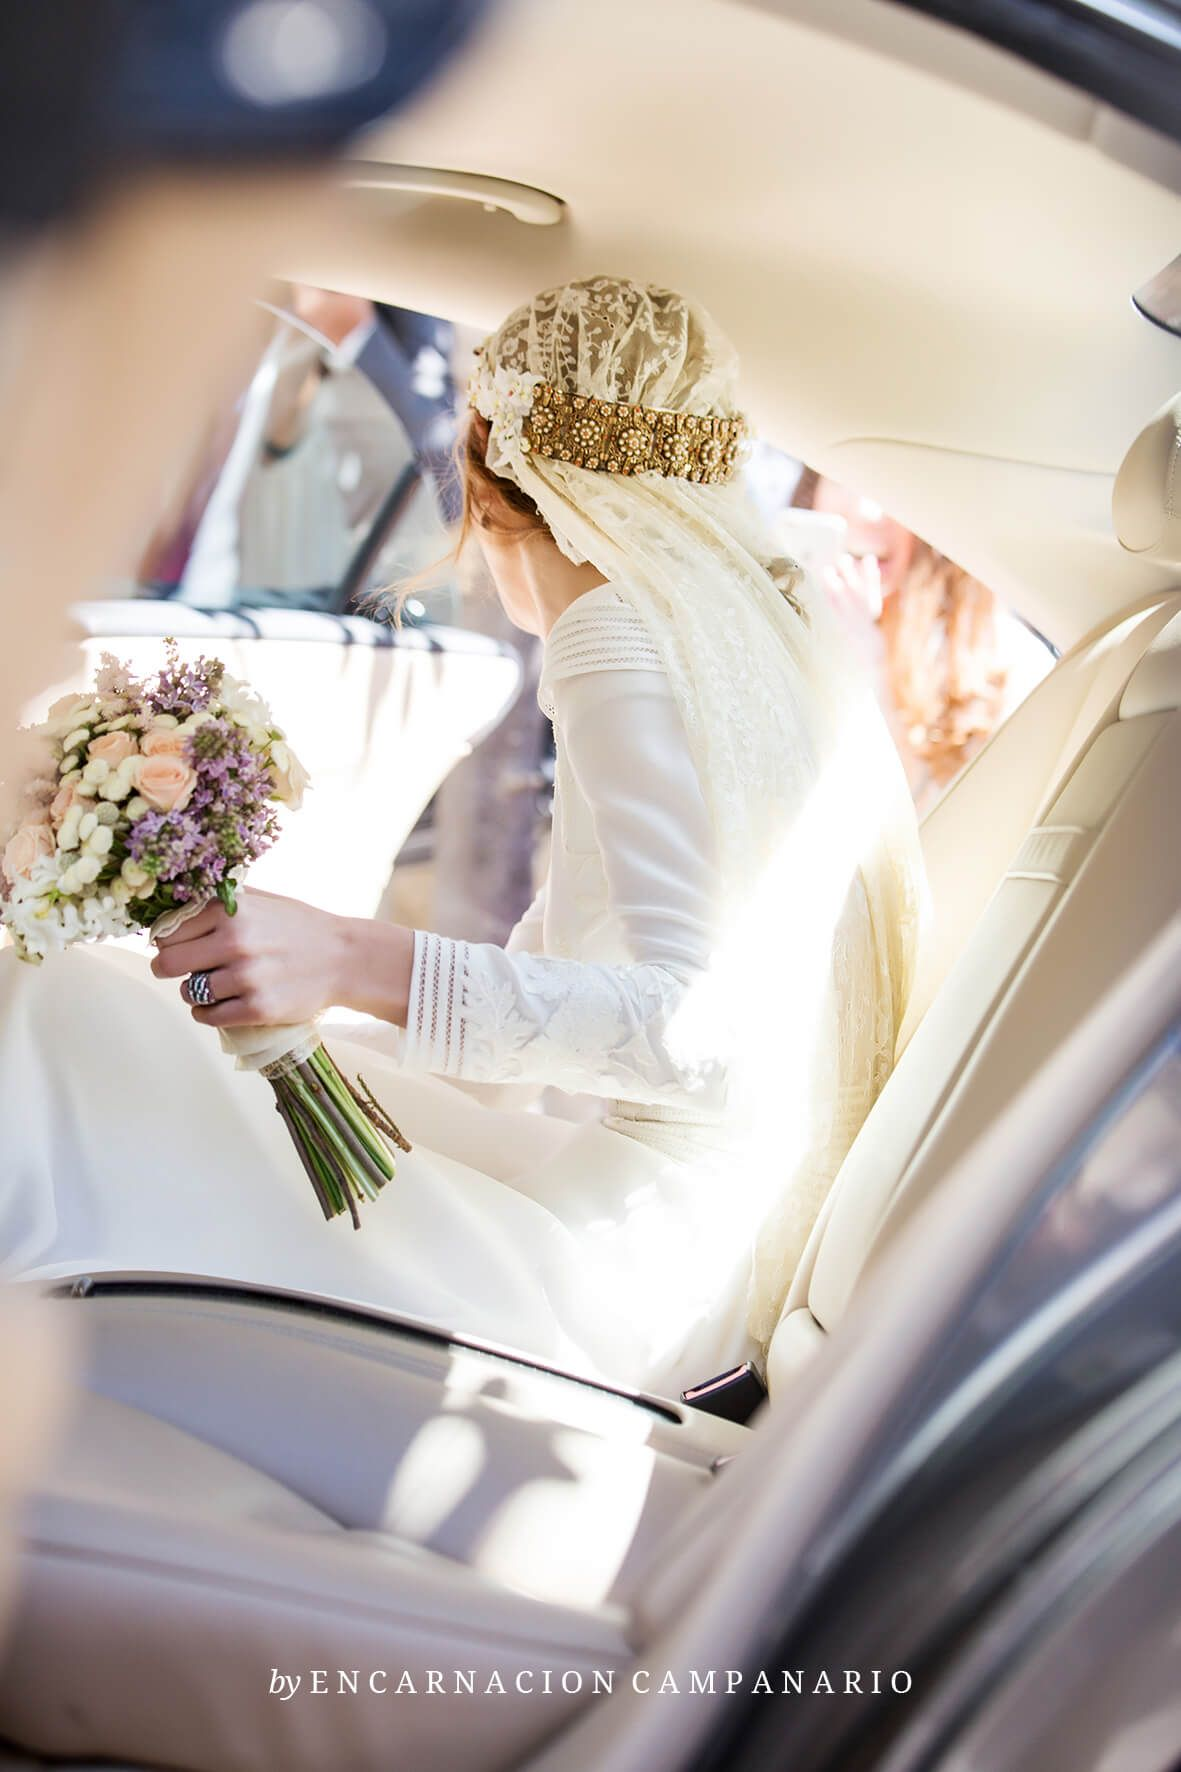 La boda de Carmina y Nacho en Jerez | Bodas, Wedding and Veil